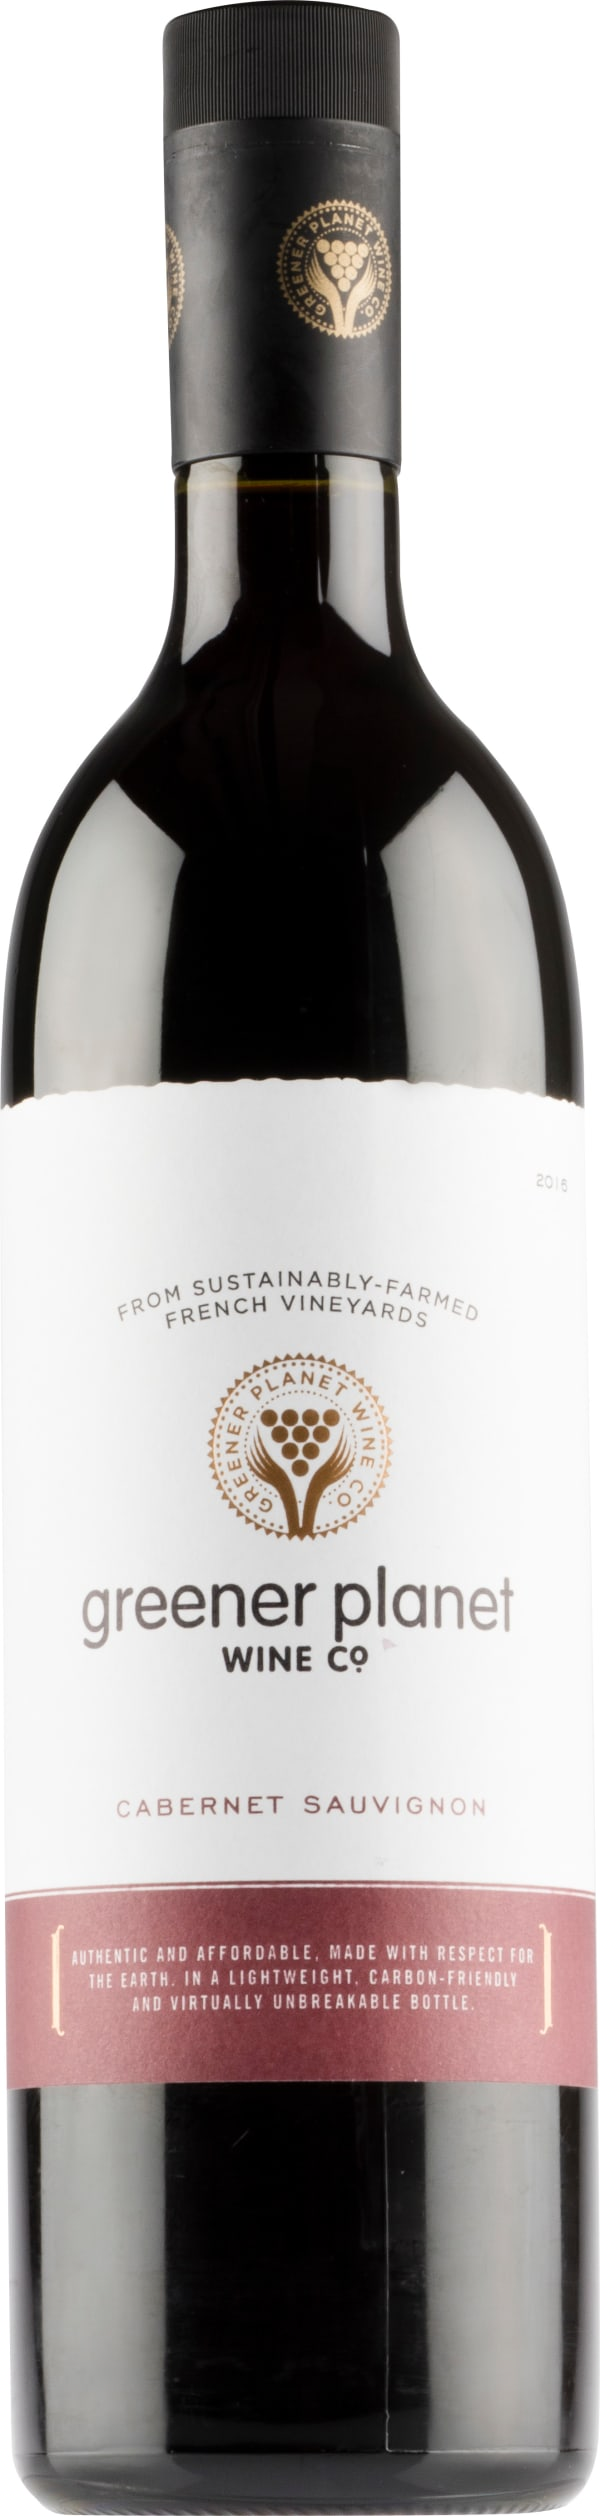 Greener Planet Cabernet Sauvignon 2018 plastic bottle